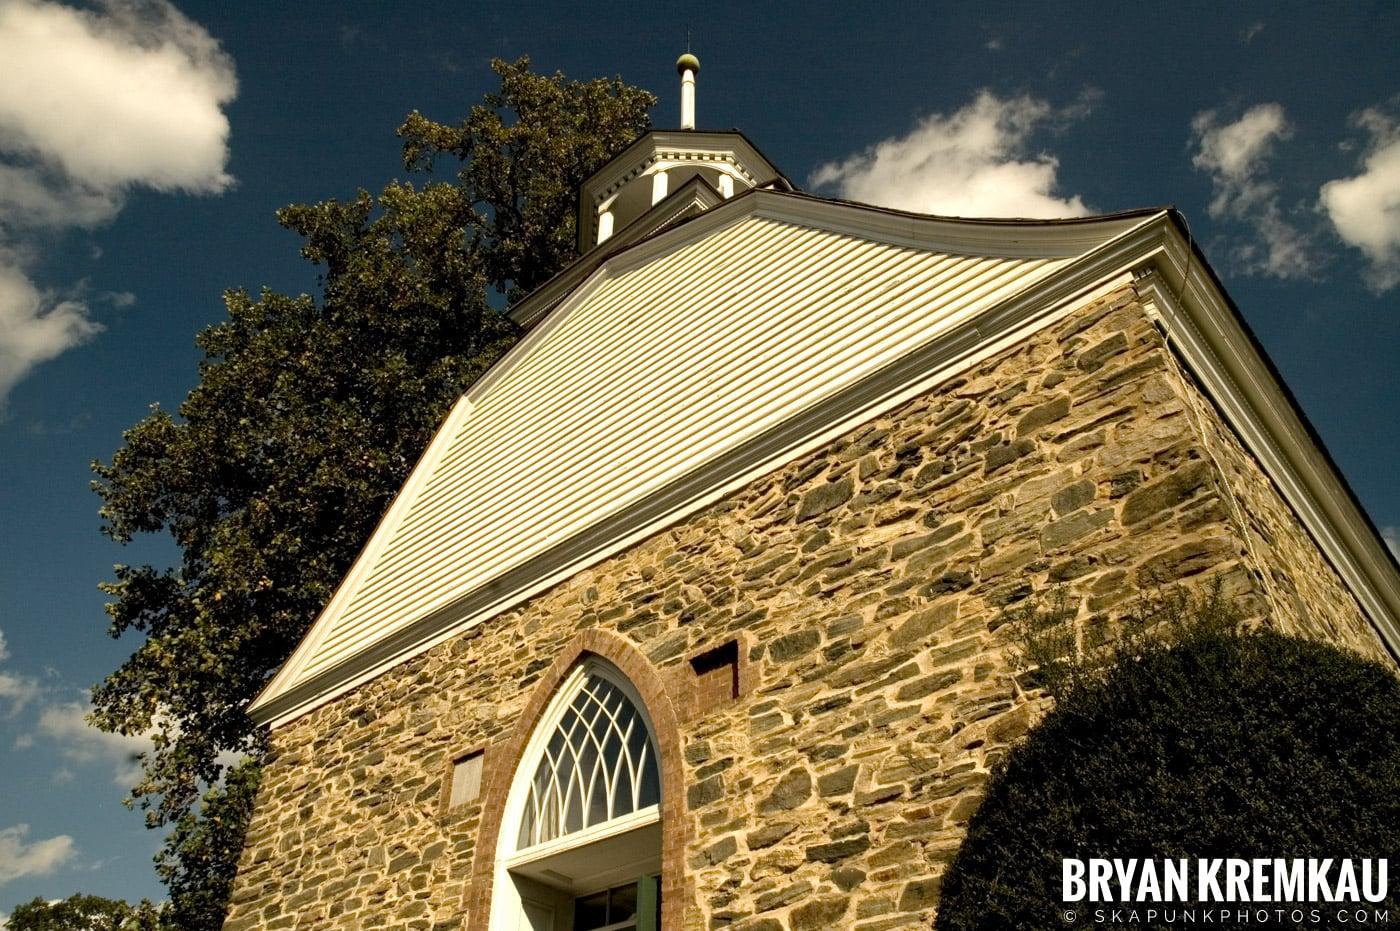 The Old Dutch Church & Lyndhurst Mansion @ Sleepy Hollow/Tarrytown, NY - 10.20.07 (33)